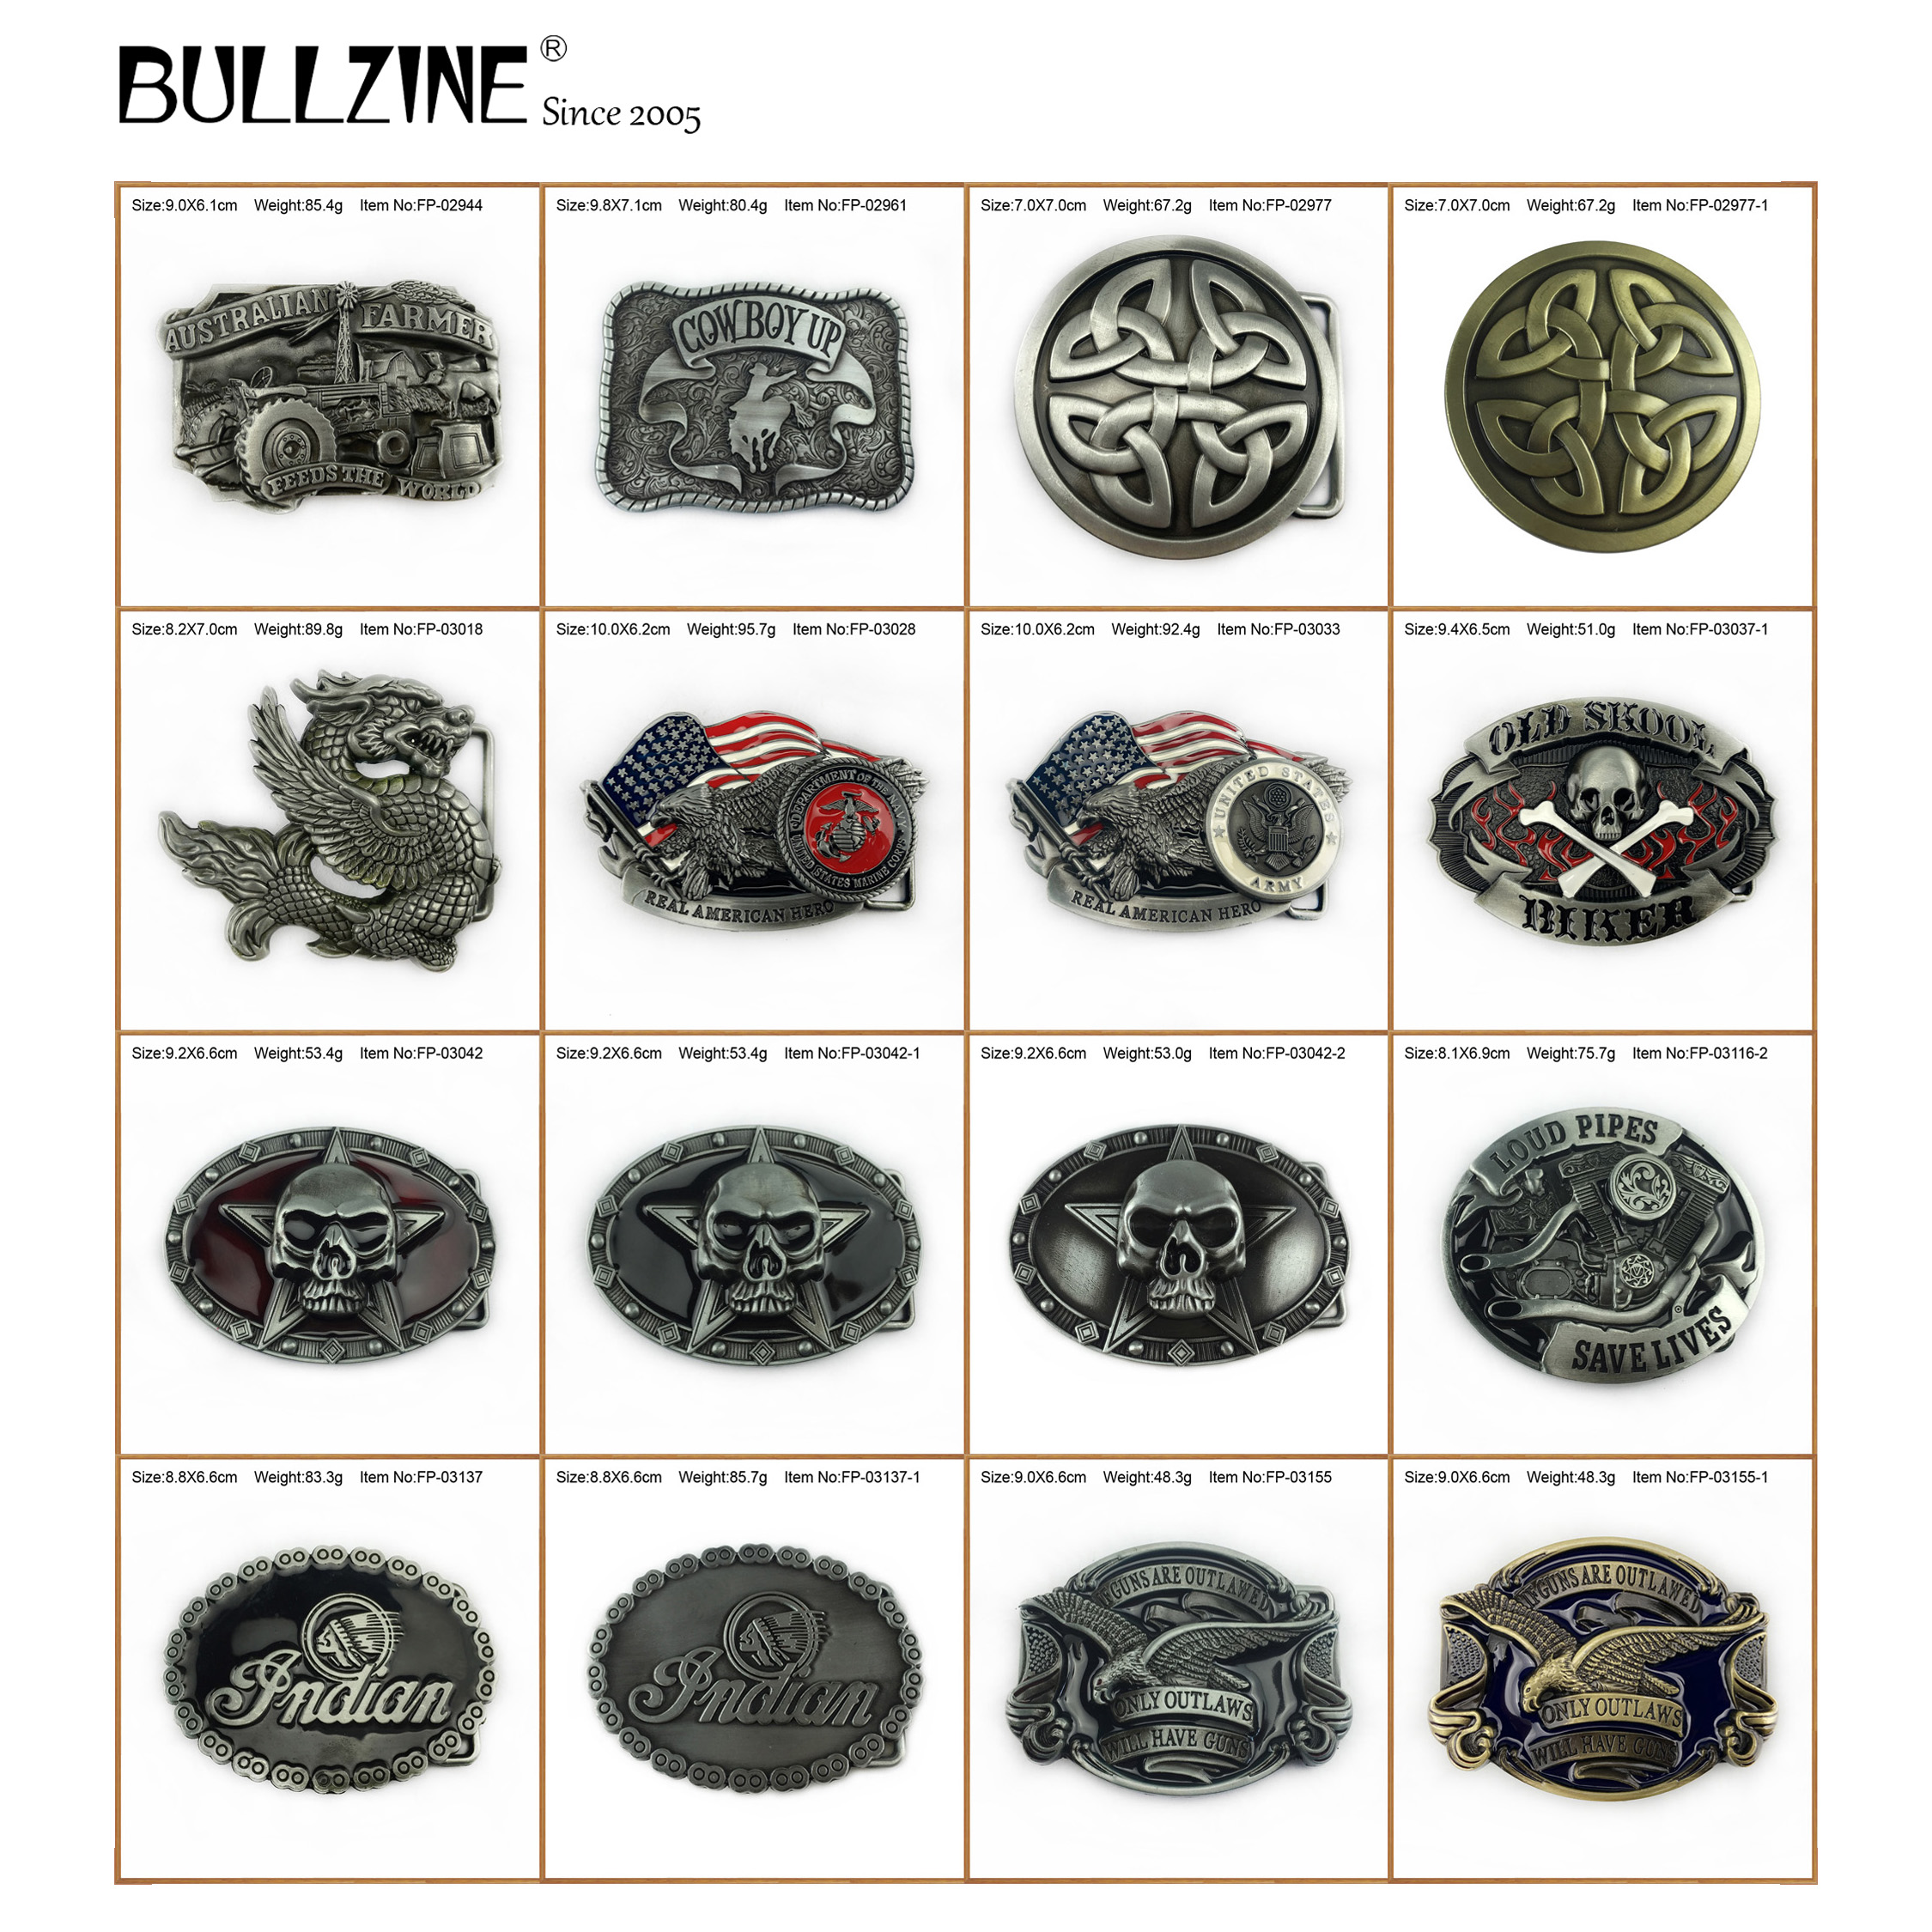 Bullzine zinc alloy Australian farmer loud pipes celtic cross eagle belt buckle INDIAN skull dragon US Army marines belt buckle